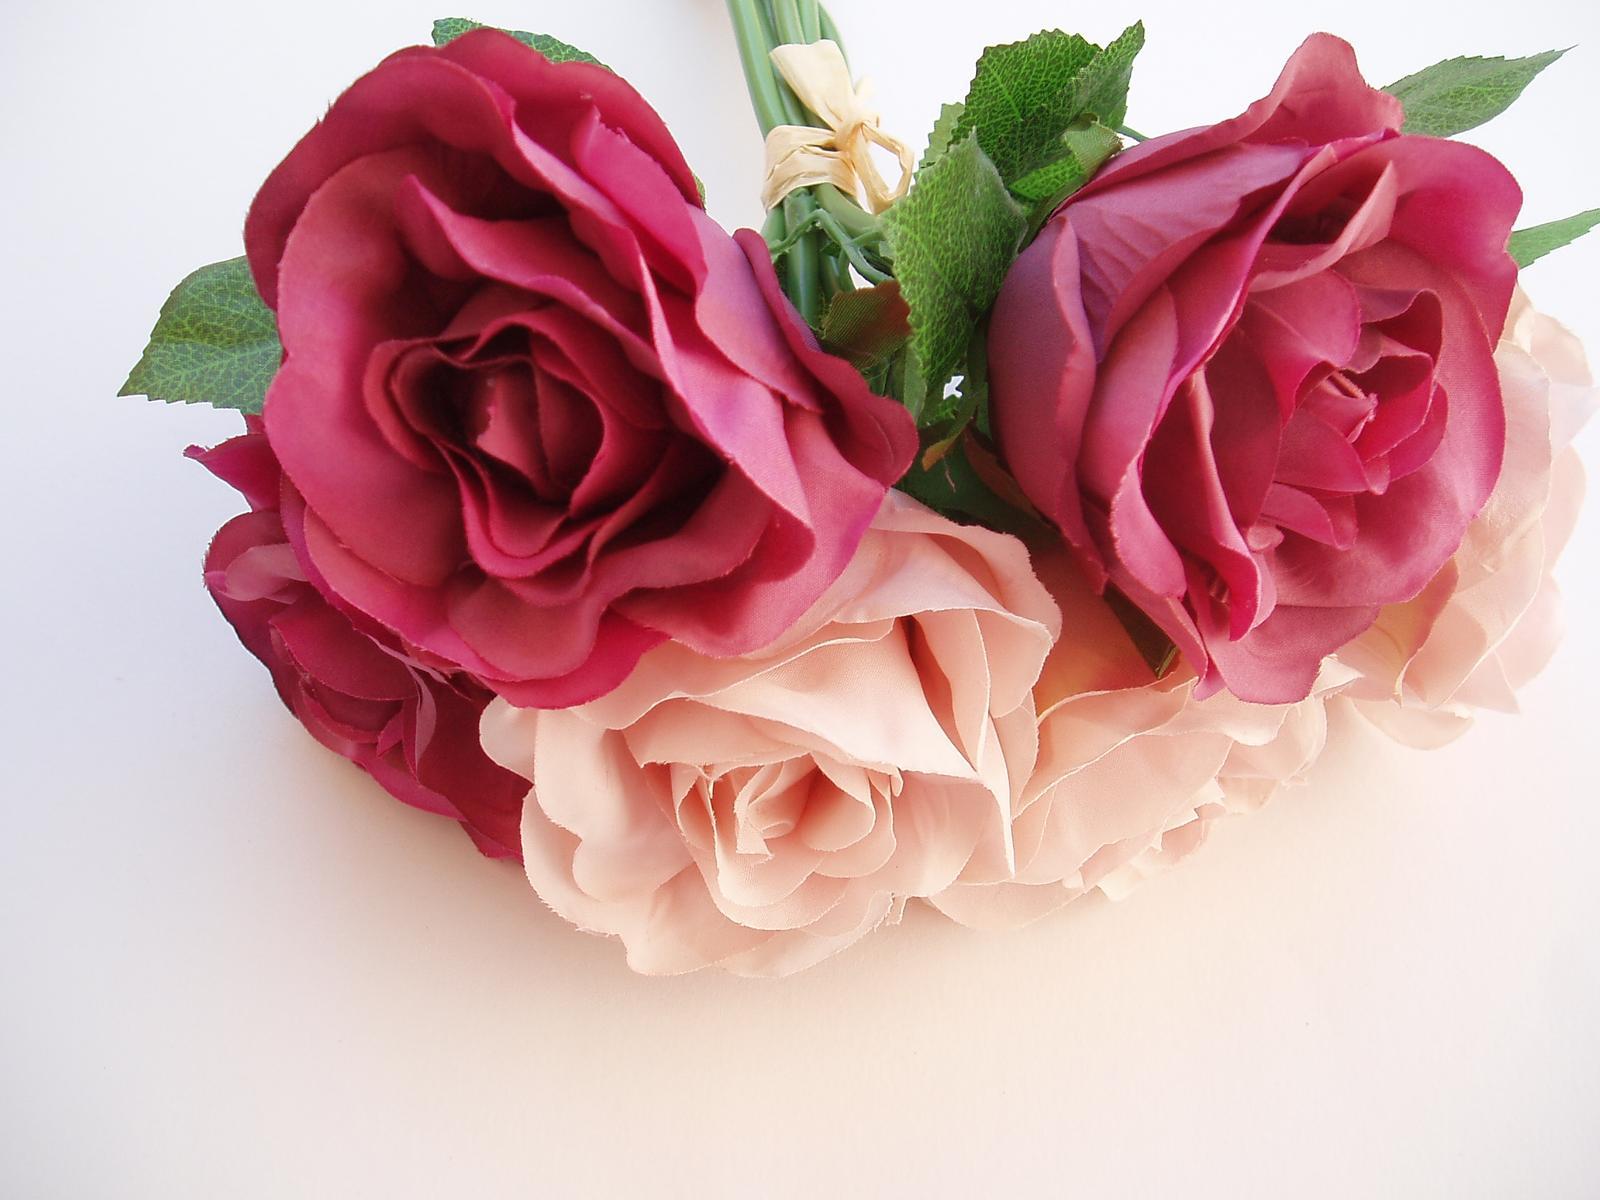 kytice růží - Obrázek č. 1